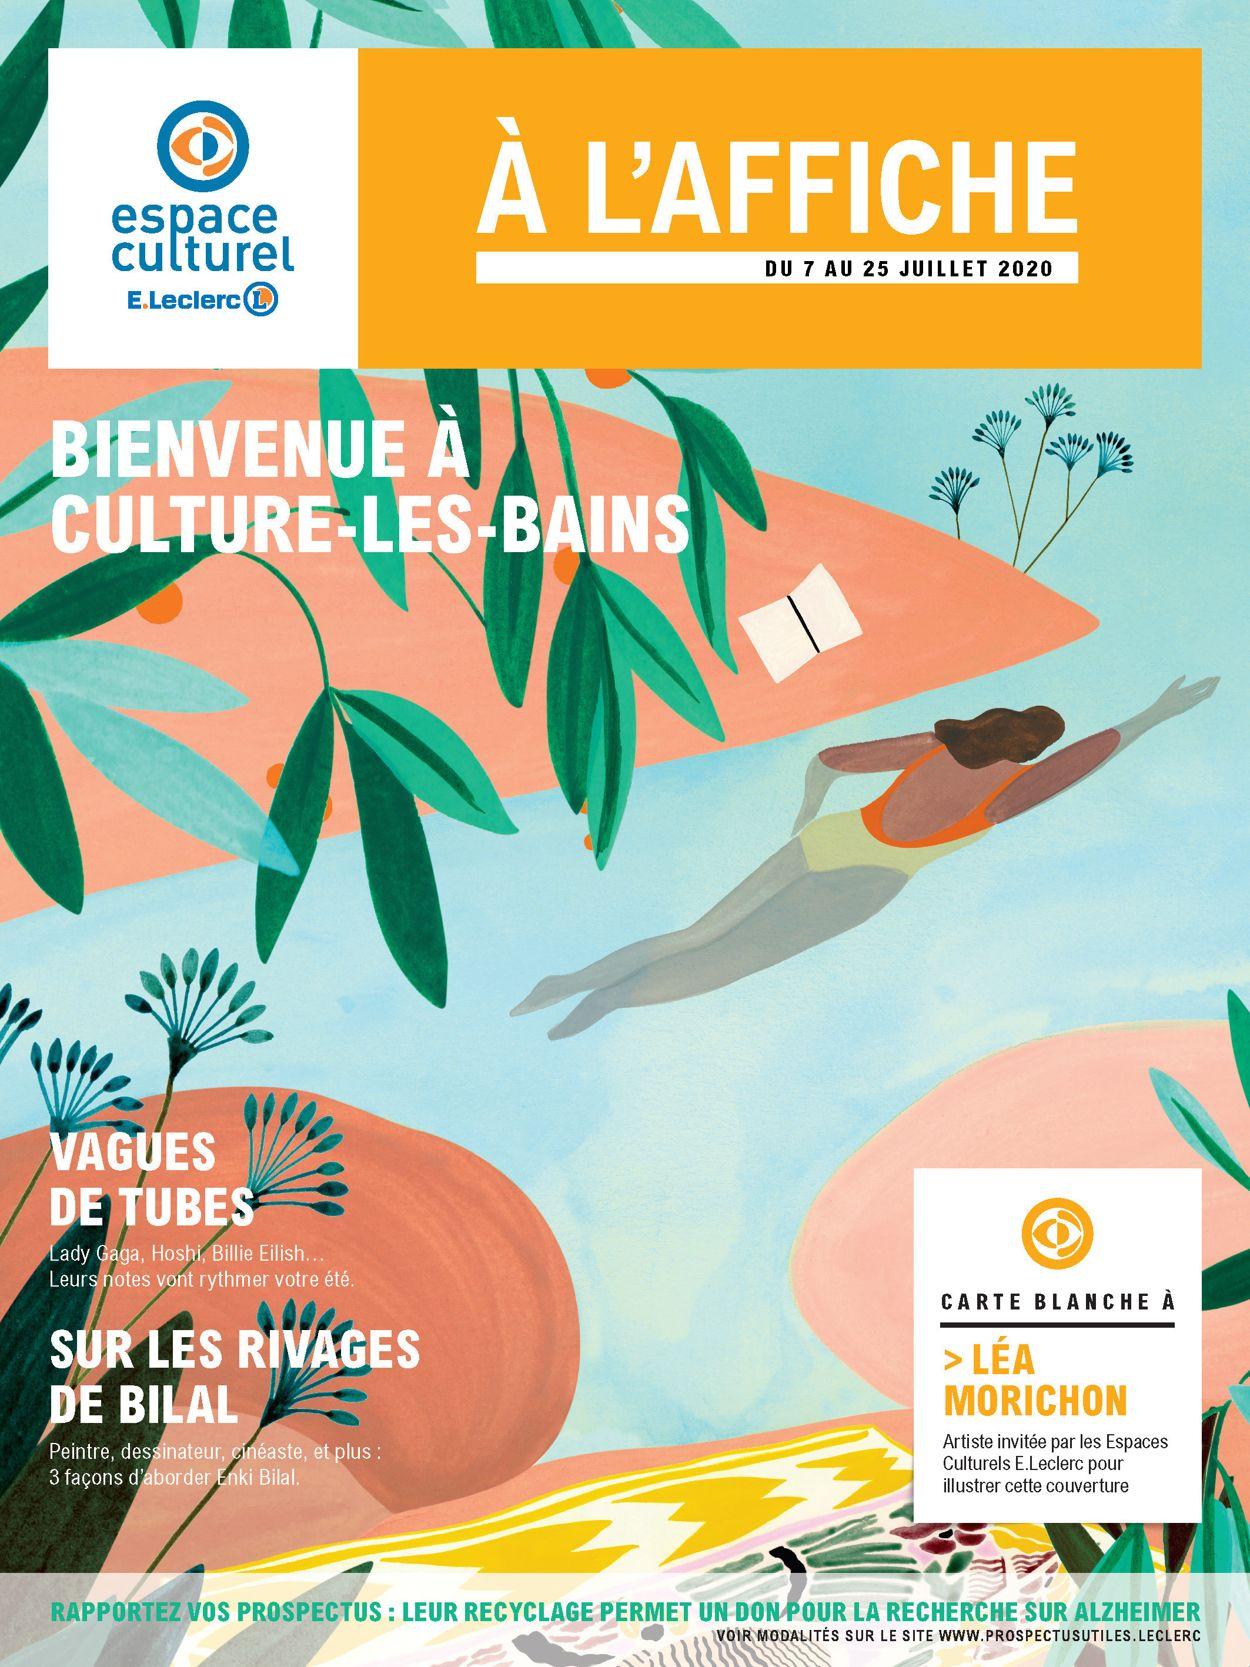 E.leclerc Catalogue - 07.07-25.07.2020